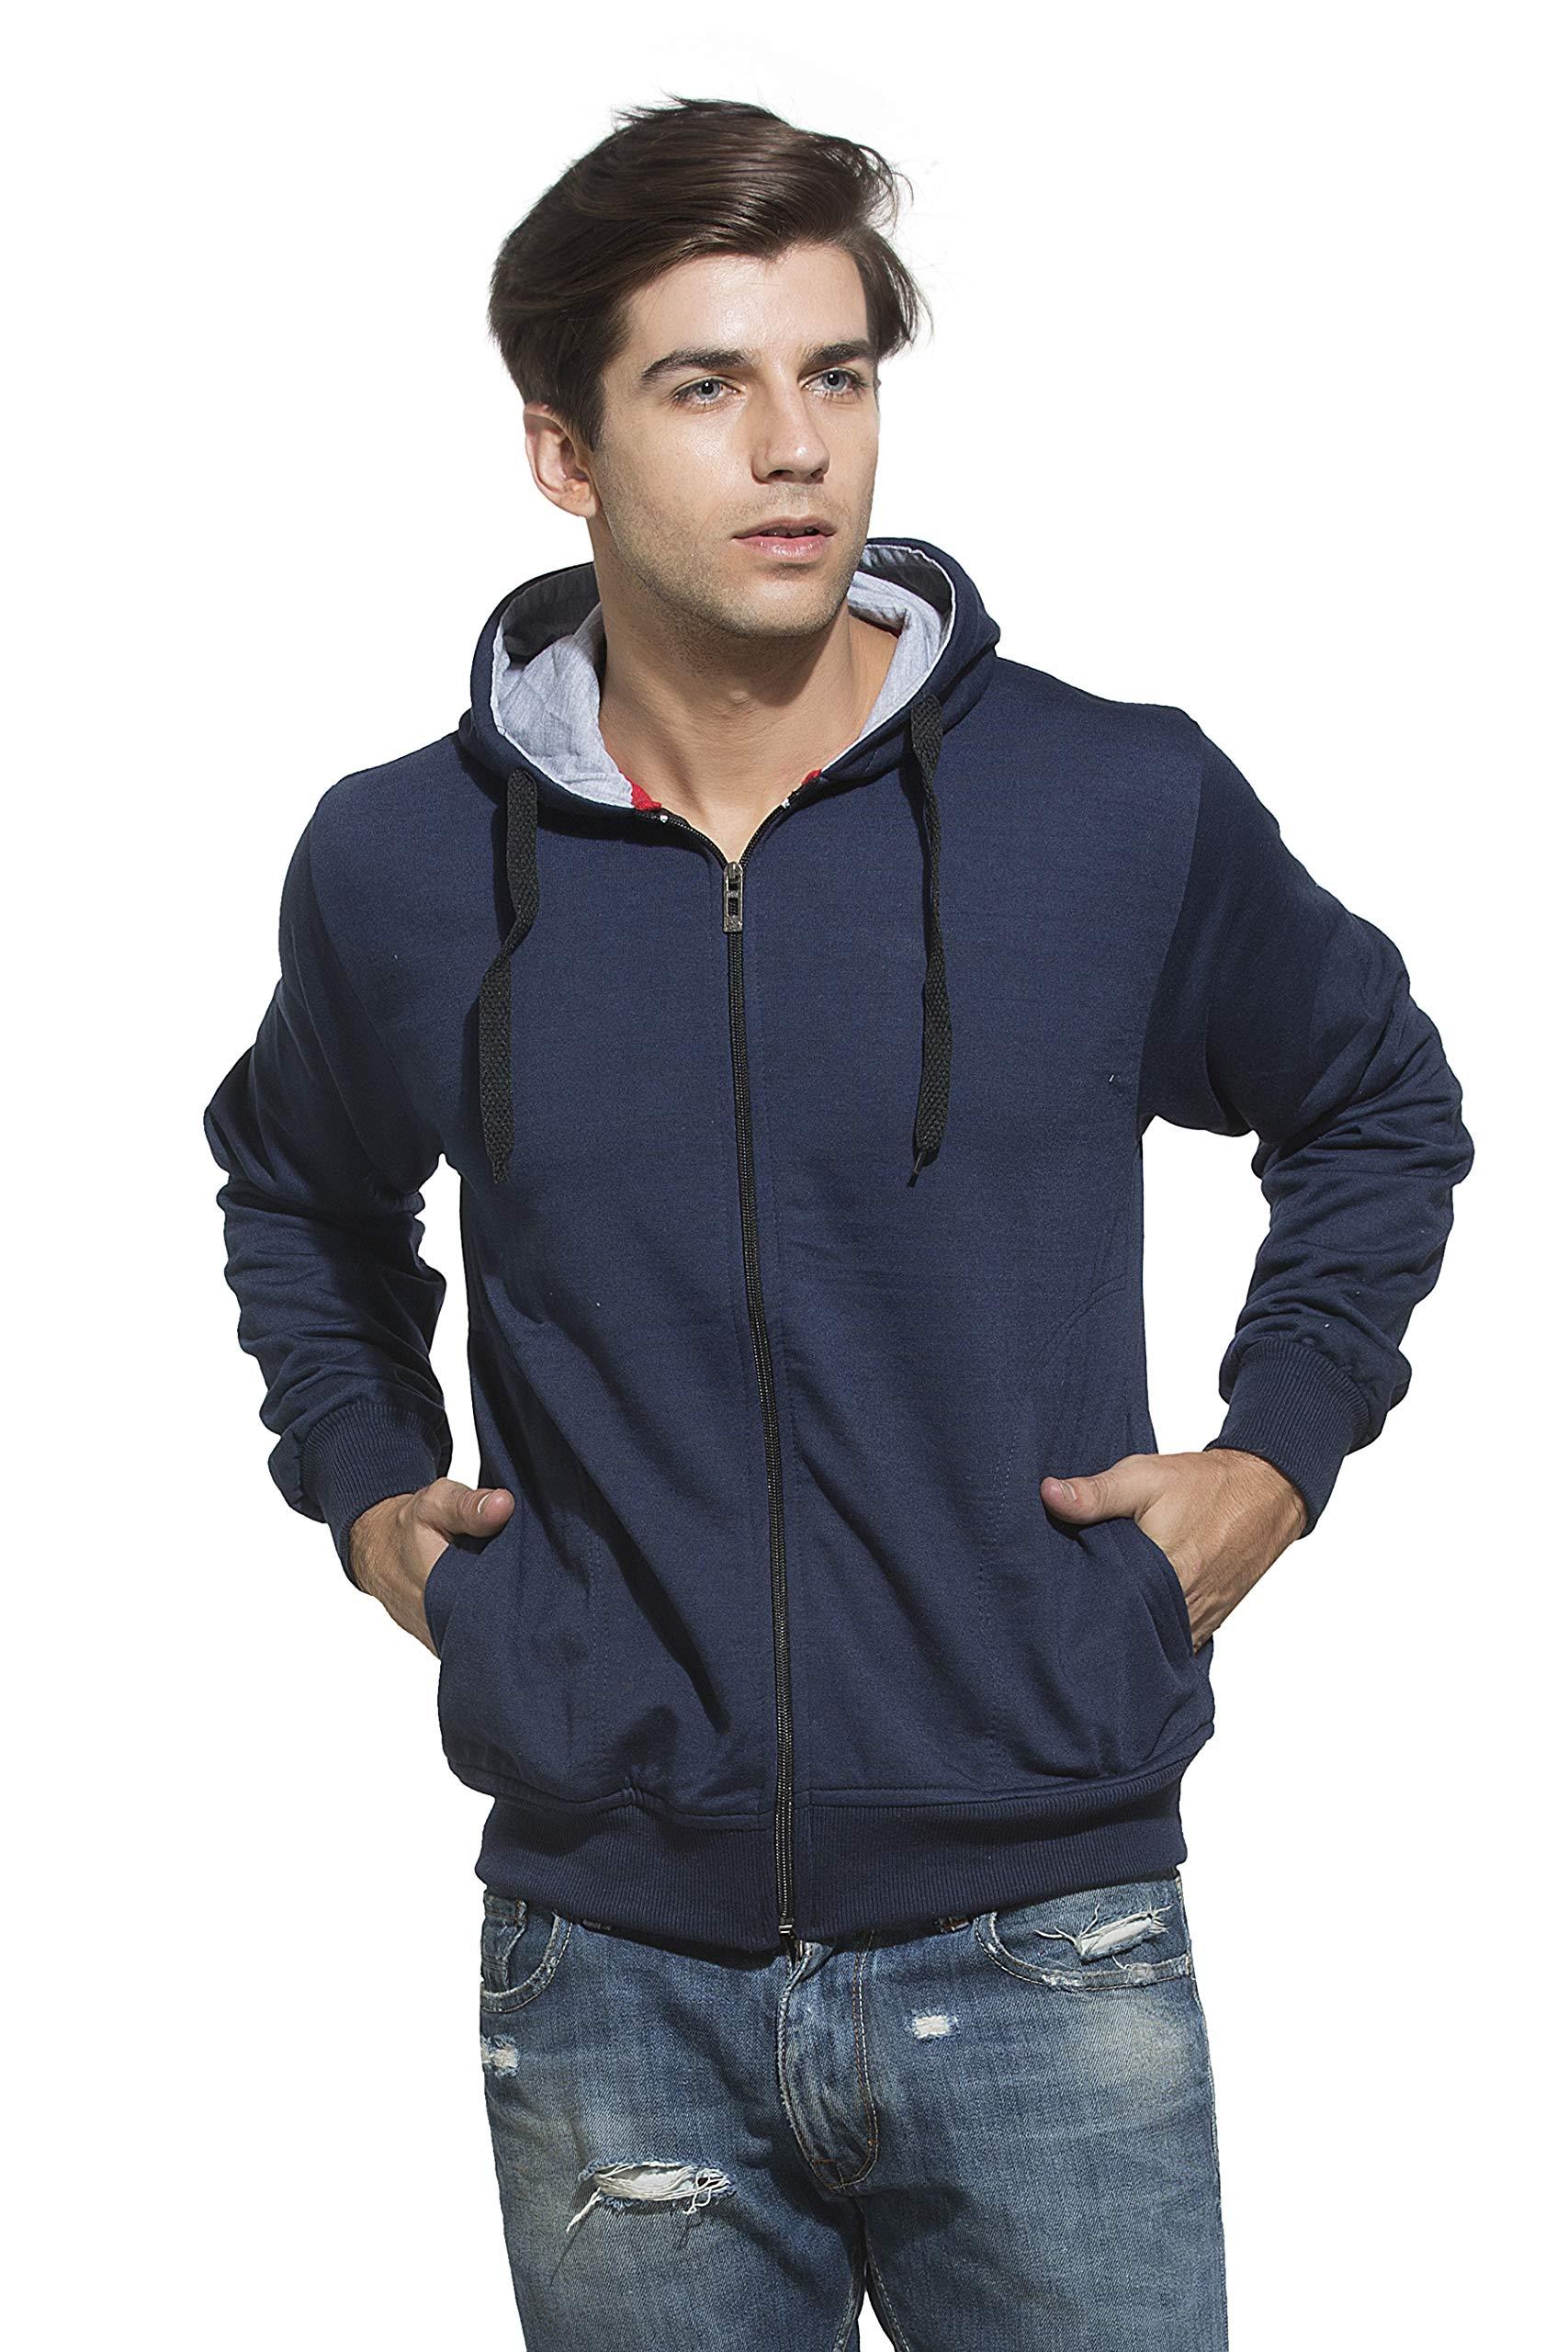 Alan Jones Clothing Men's Cotton Hooded Sweatshirt product image